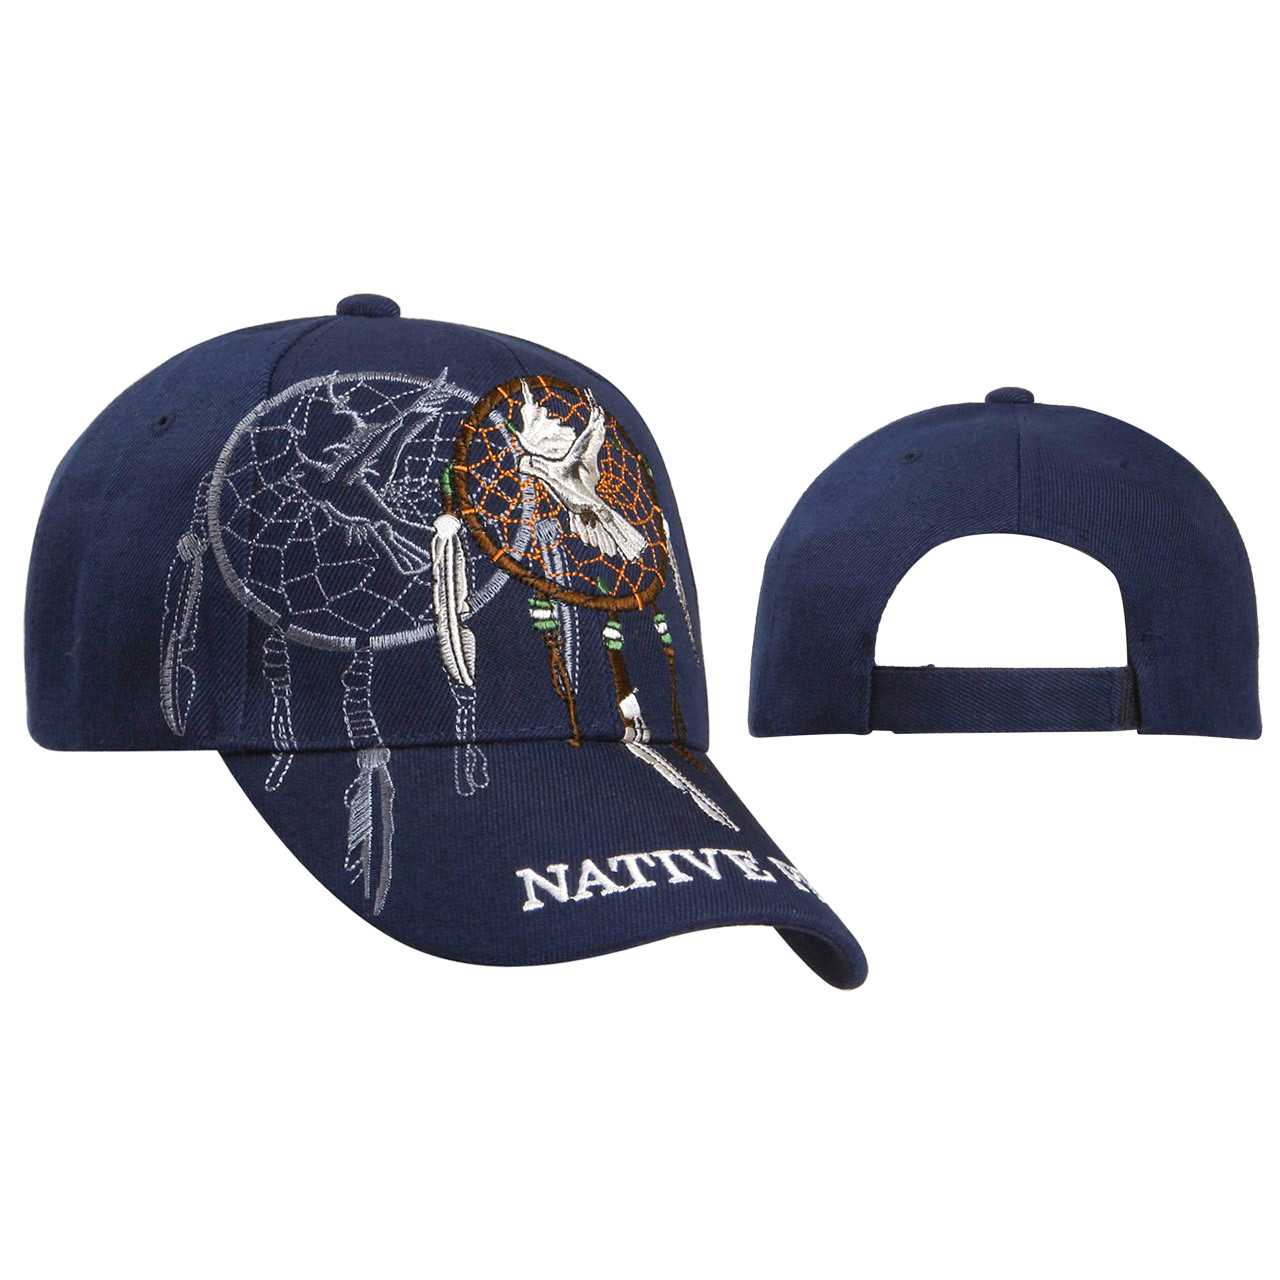 Baseball Caps Wholesale ~ Dreamcatcher with Dove ~ Navy Blue